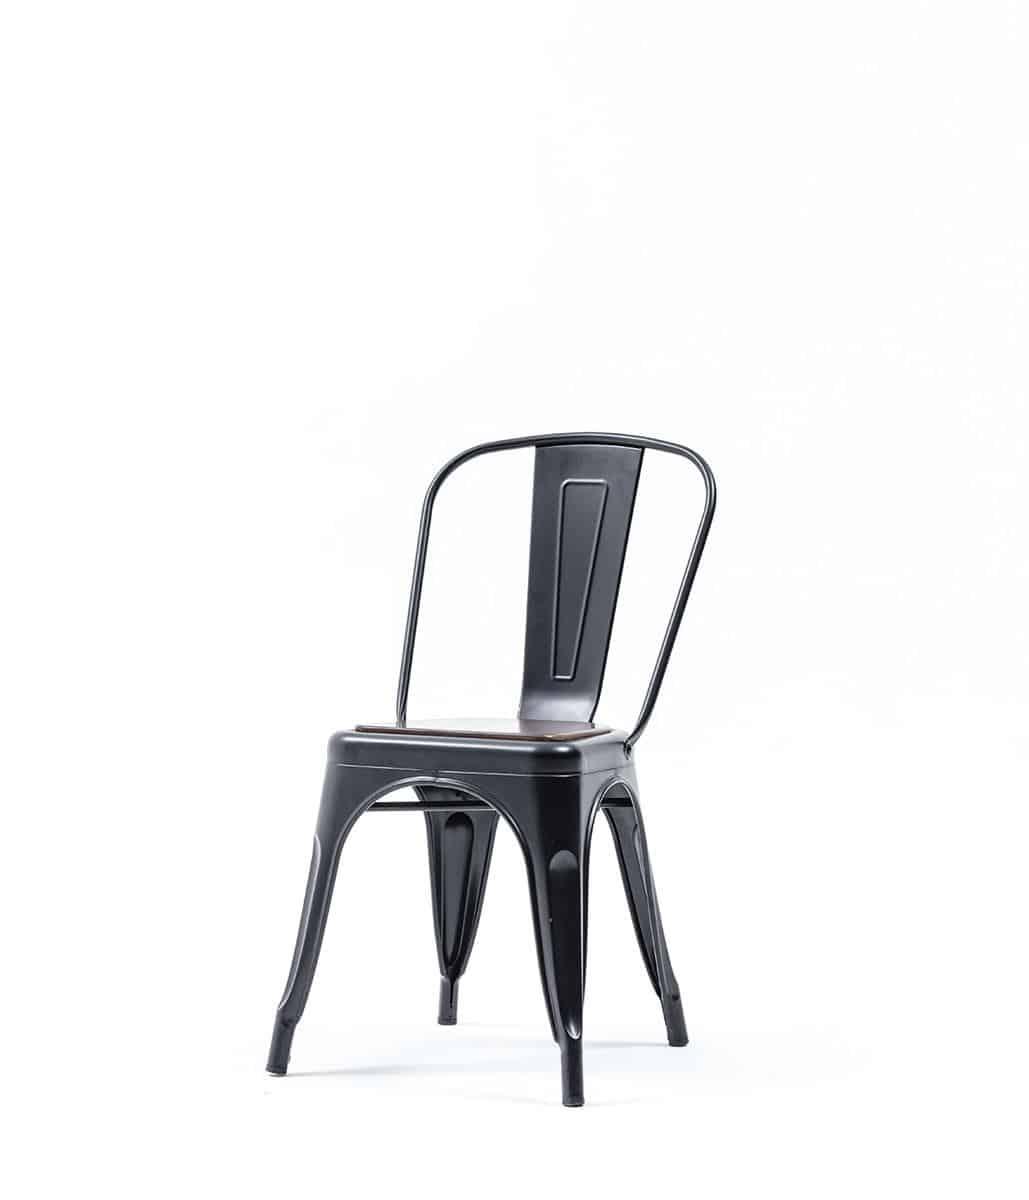 urun-tolix-sandalye-01